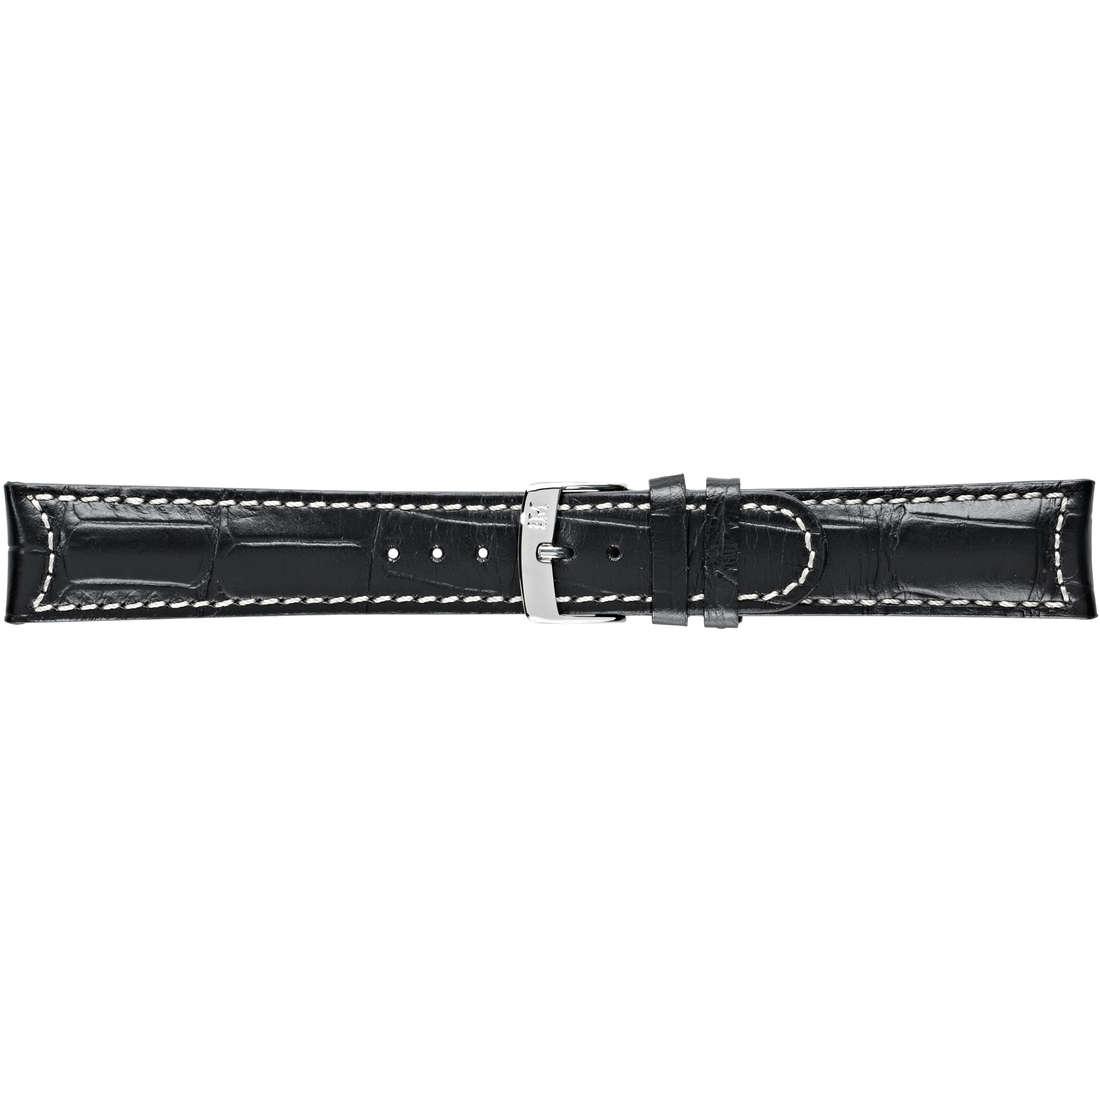 watch watch bands watch straps man Morellato Manufatti A01U3882A59019CR18